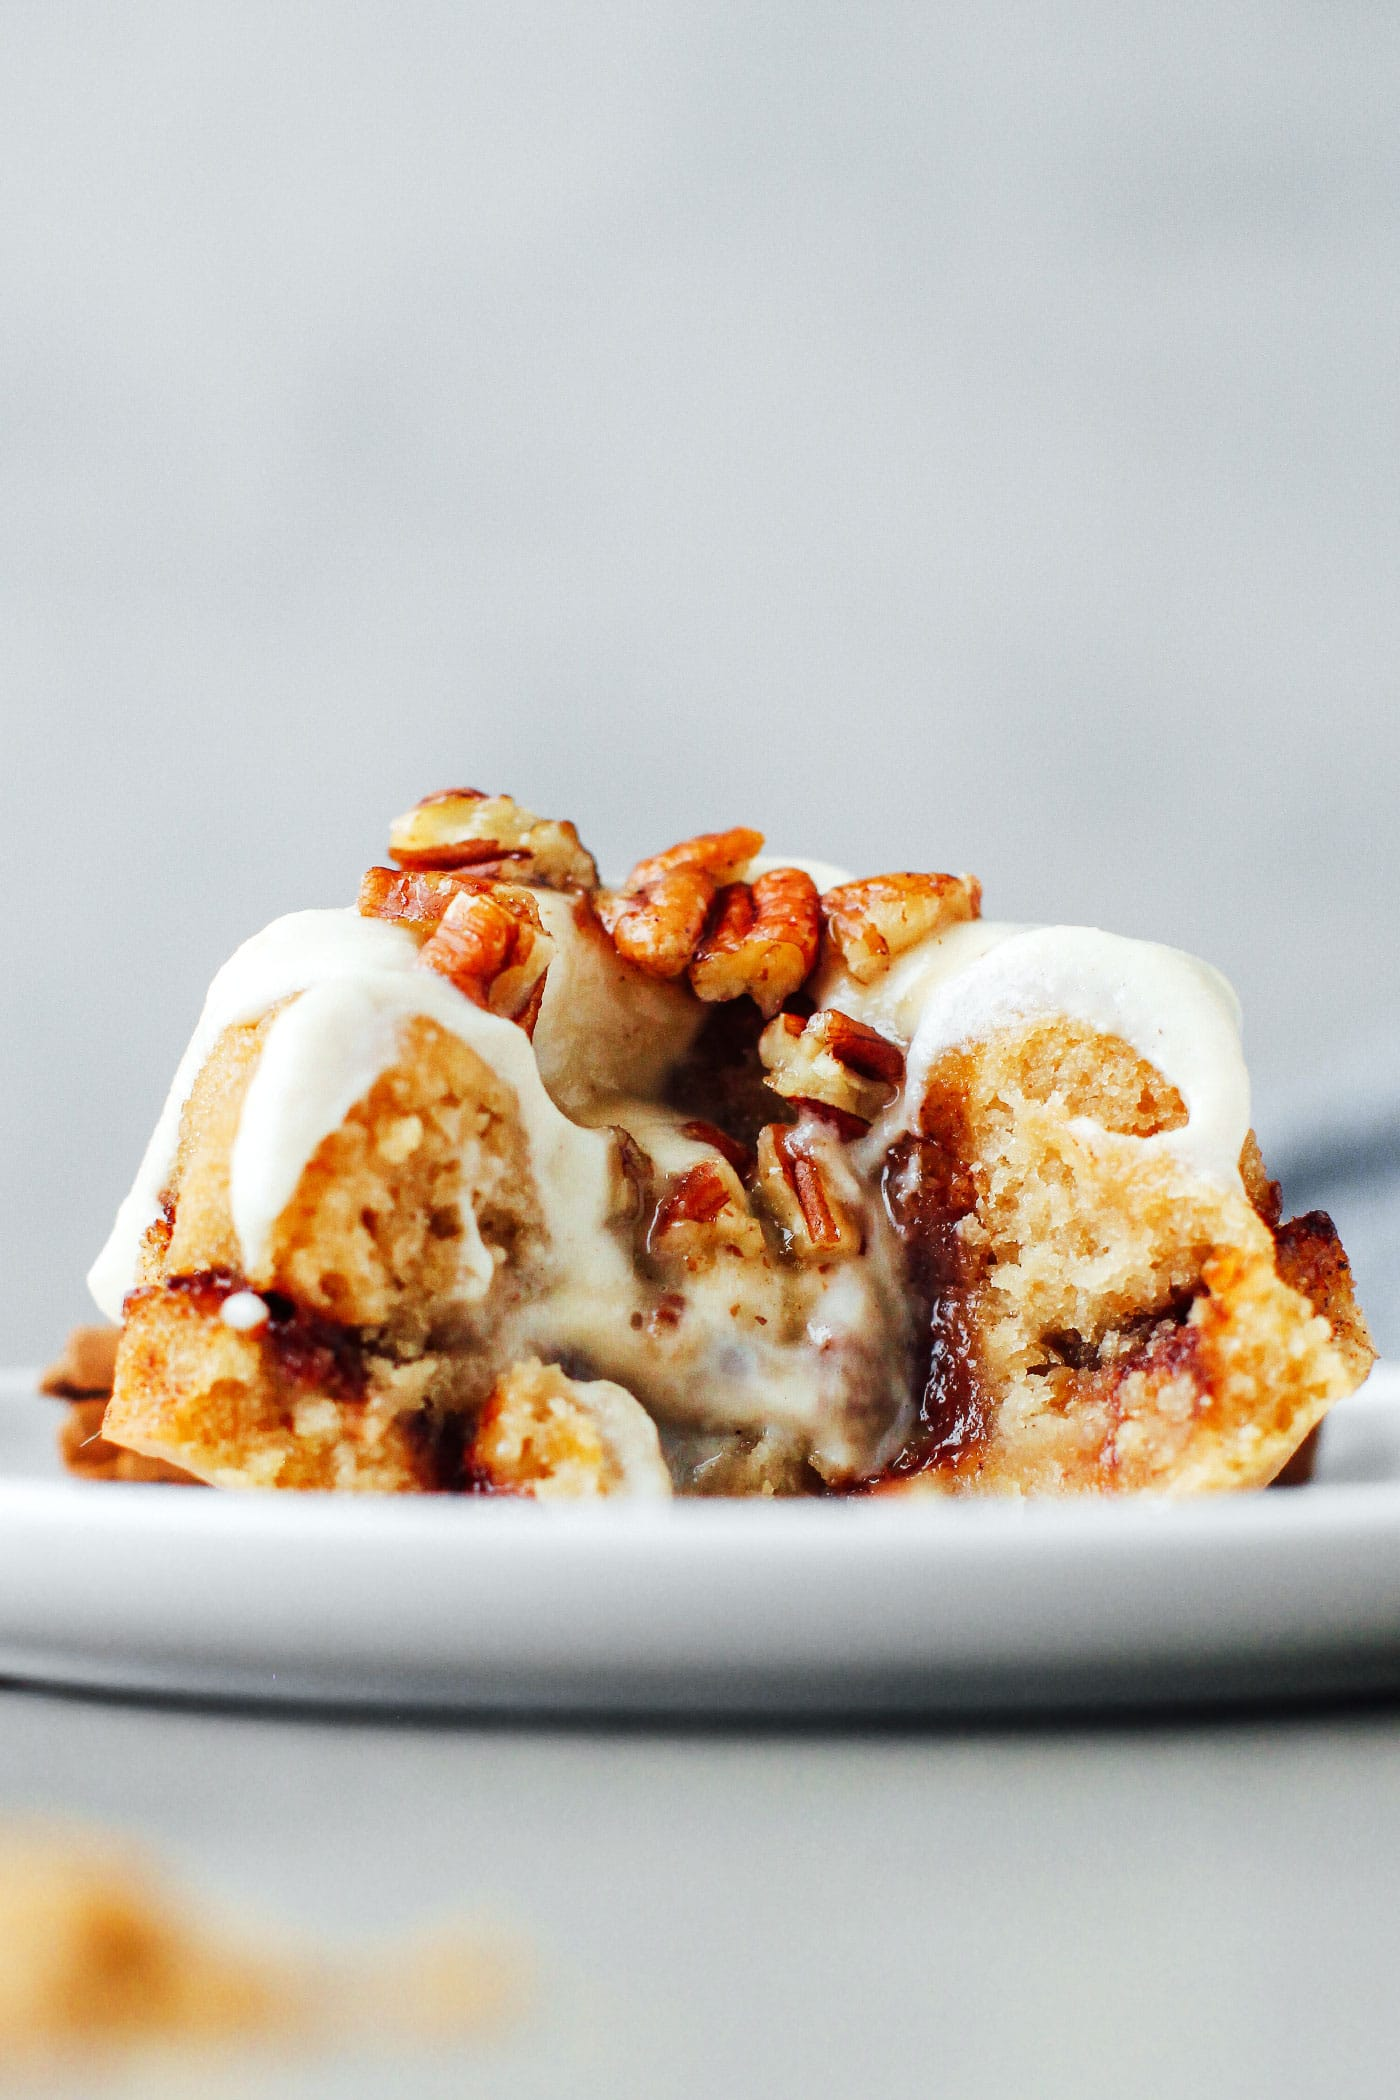 Mini Cinnamon Swirl Bundt Cakes